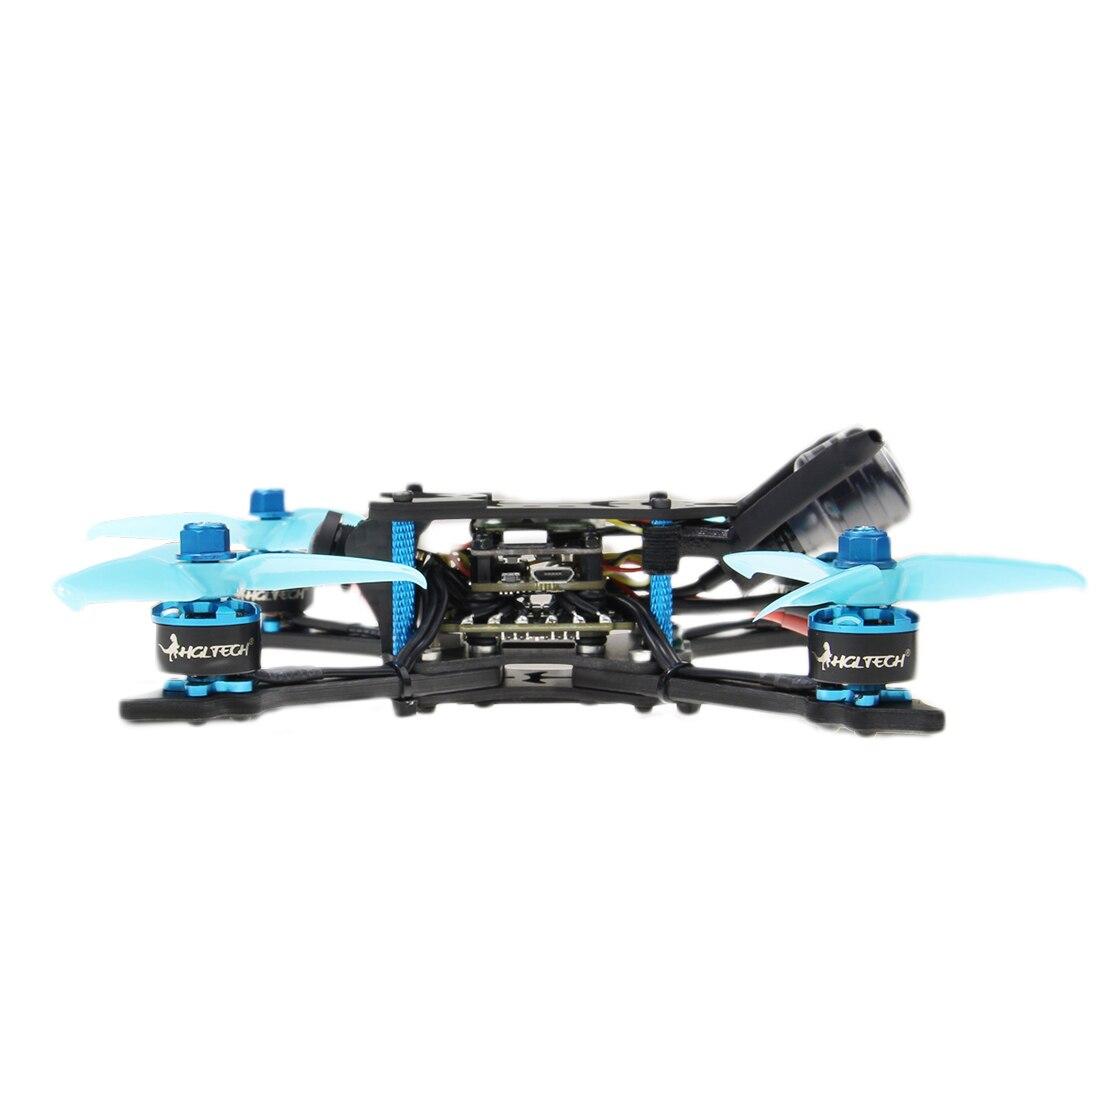 HGLRC Arrow3 152mm de 3 pulgadas F4 OSD 4S/6 S Mini FPV Racer Dron PNP BNF con 45A CES Caddx Ratel 1200TVL Cámara RC Quadcopter - 5